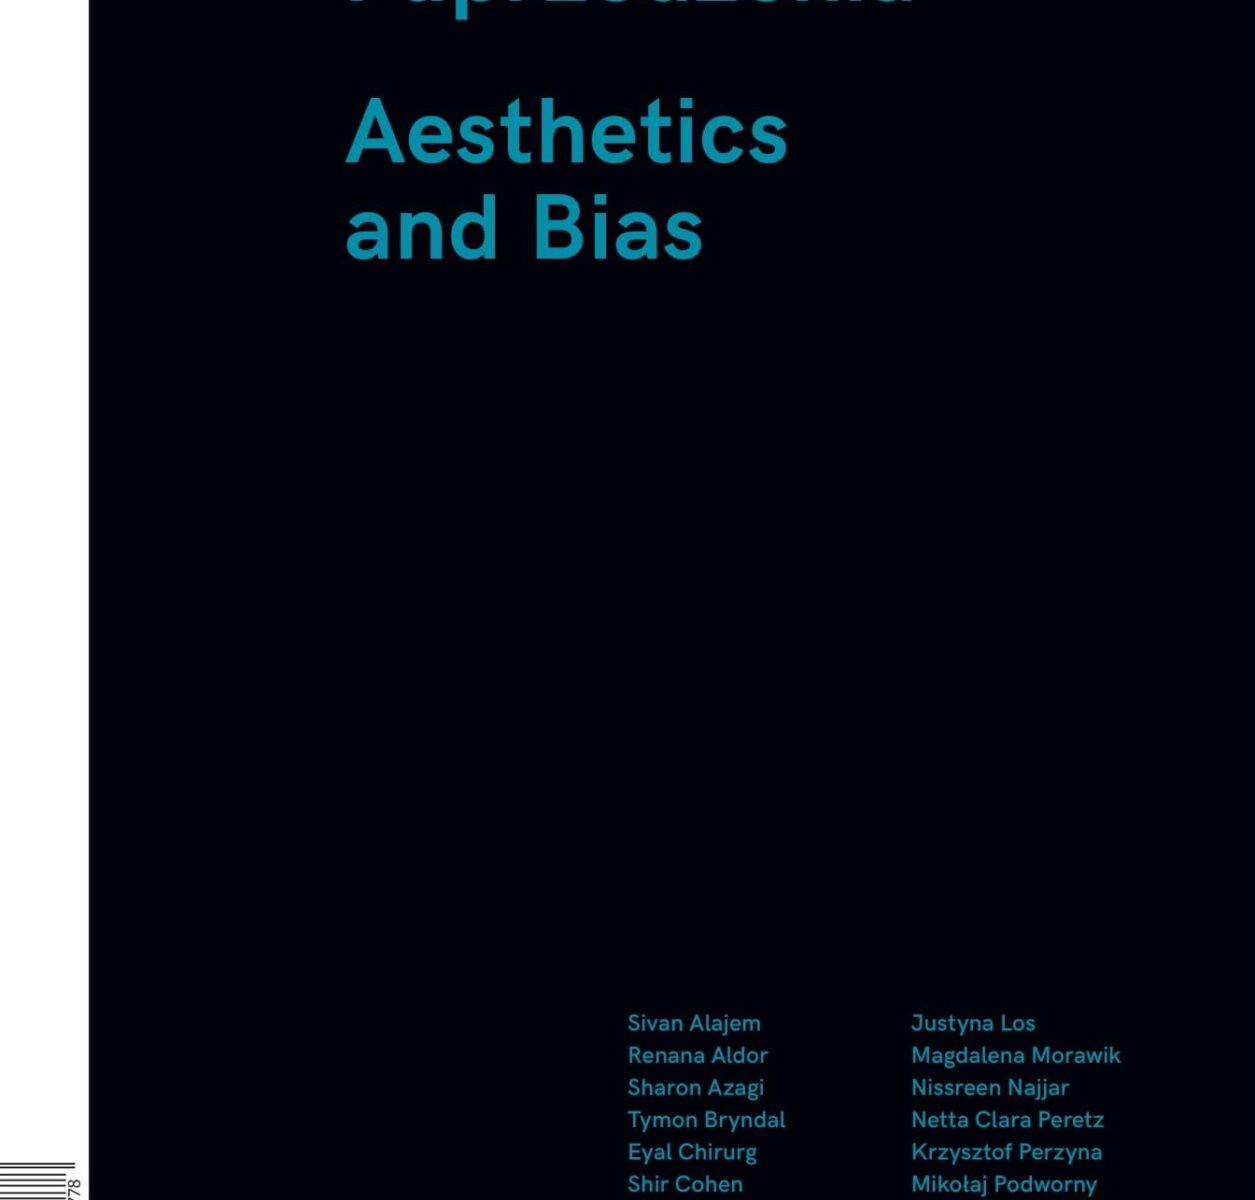 Estetyka i uprzedzenia - Estetyka i uprzedzenia Aesthetics and Bias